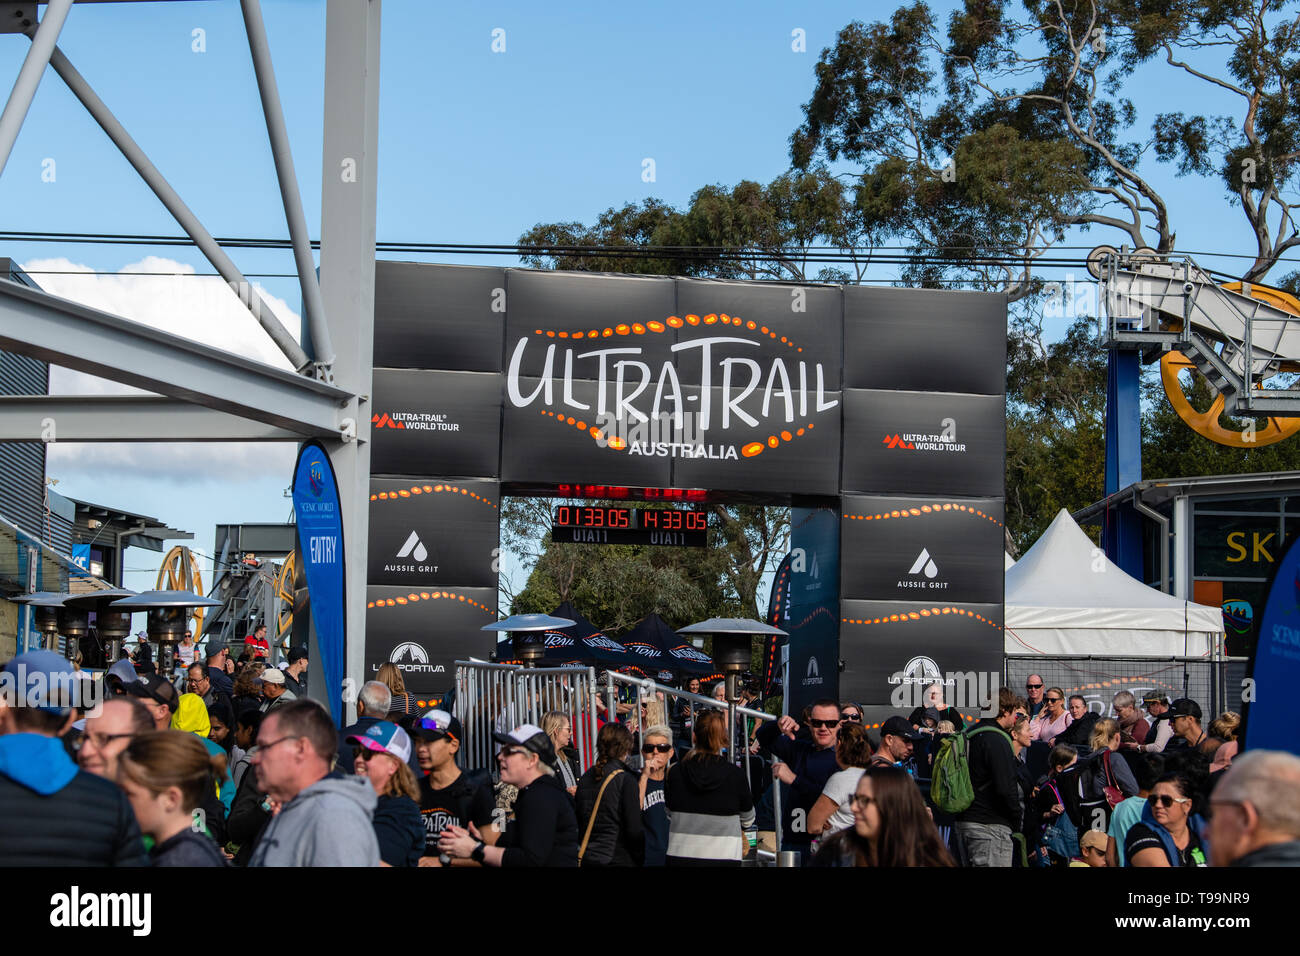 Blue Mountains, Australia - April 16 2019: Ultra-Trail Australia UTA11 race. Crowds at finish line. - Stock Image